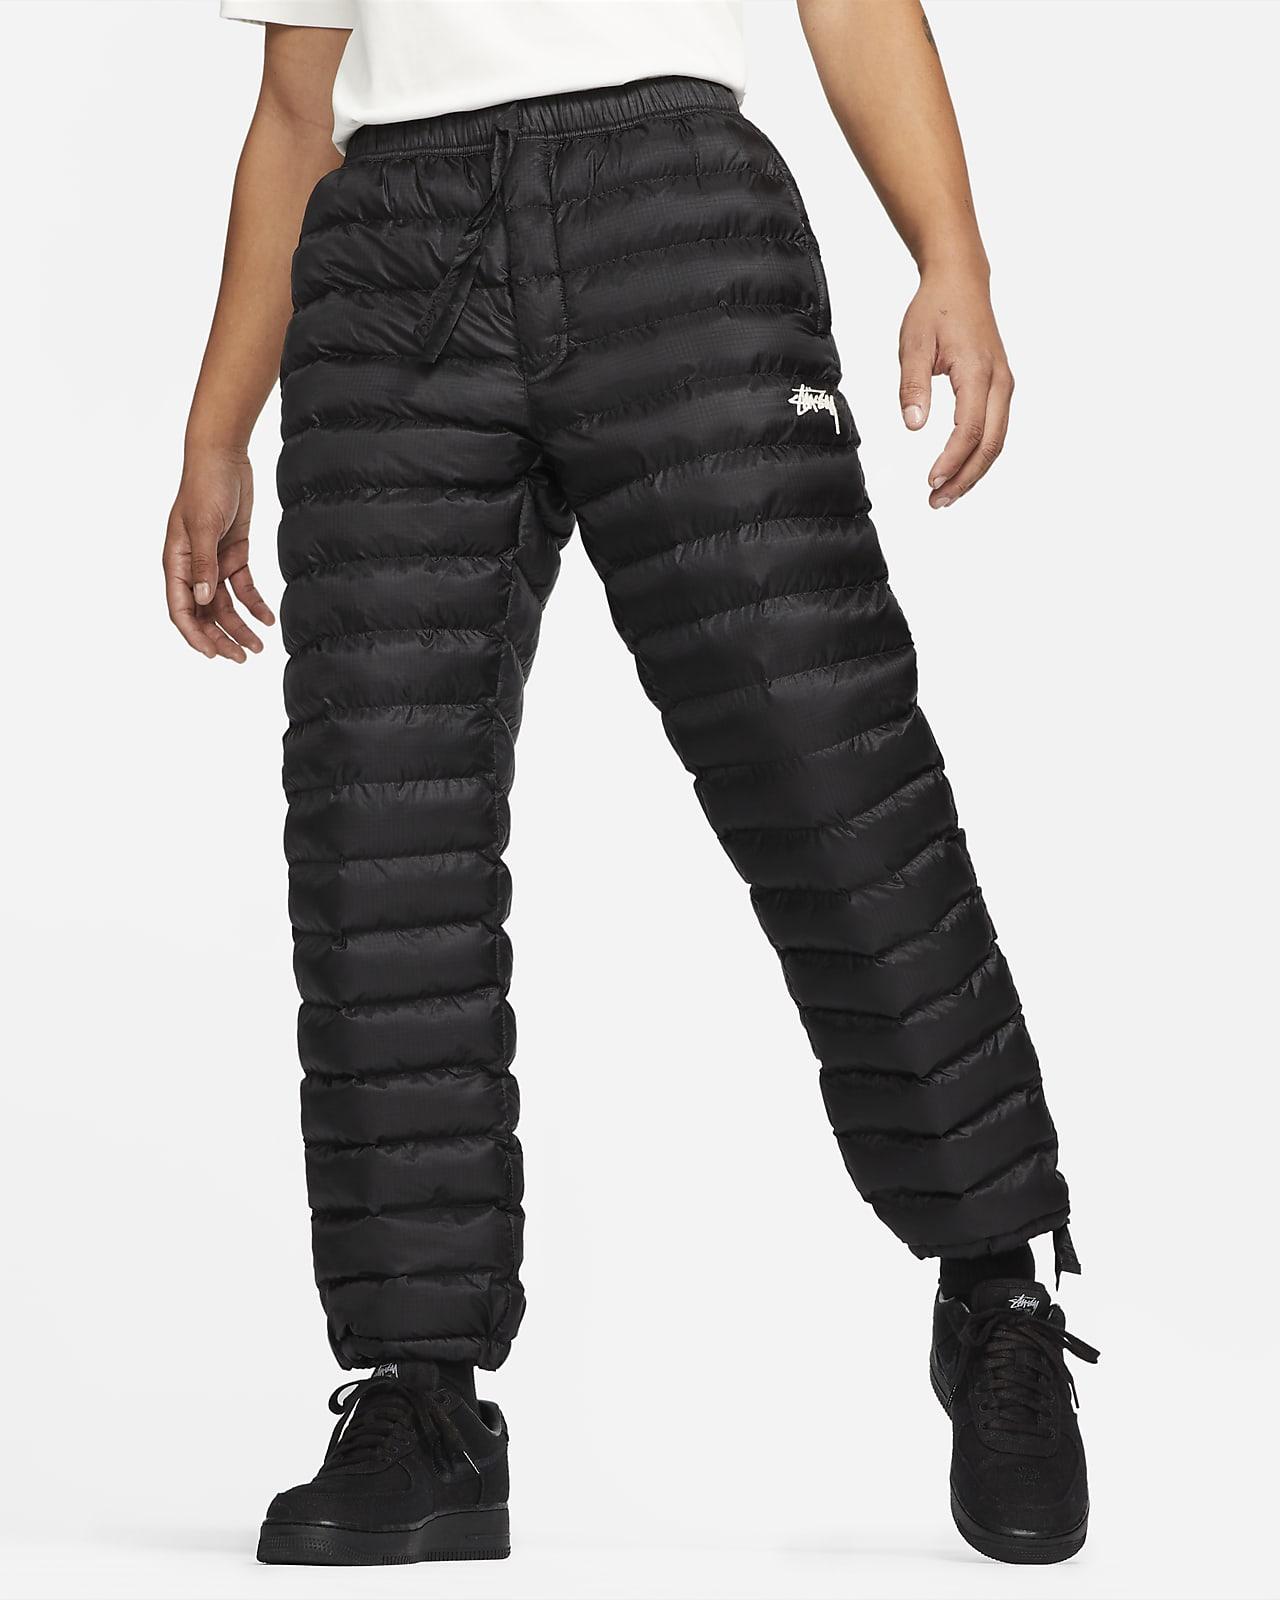 Nike x Stüssy Insulated Trousers